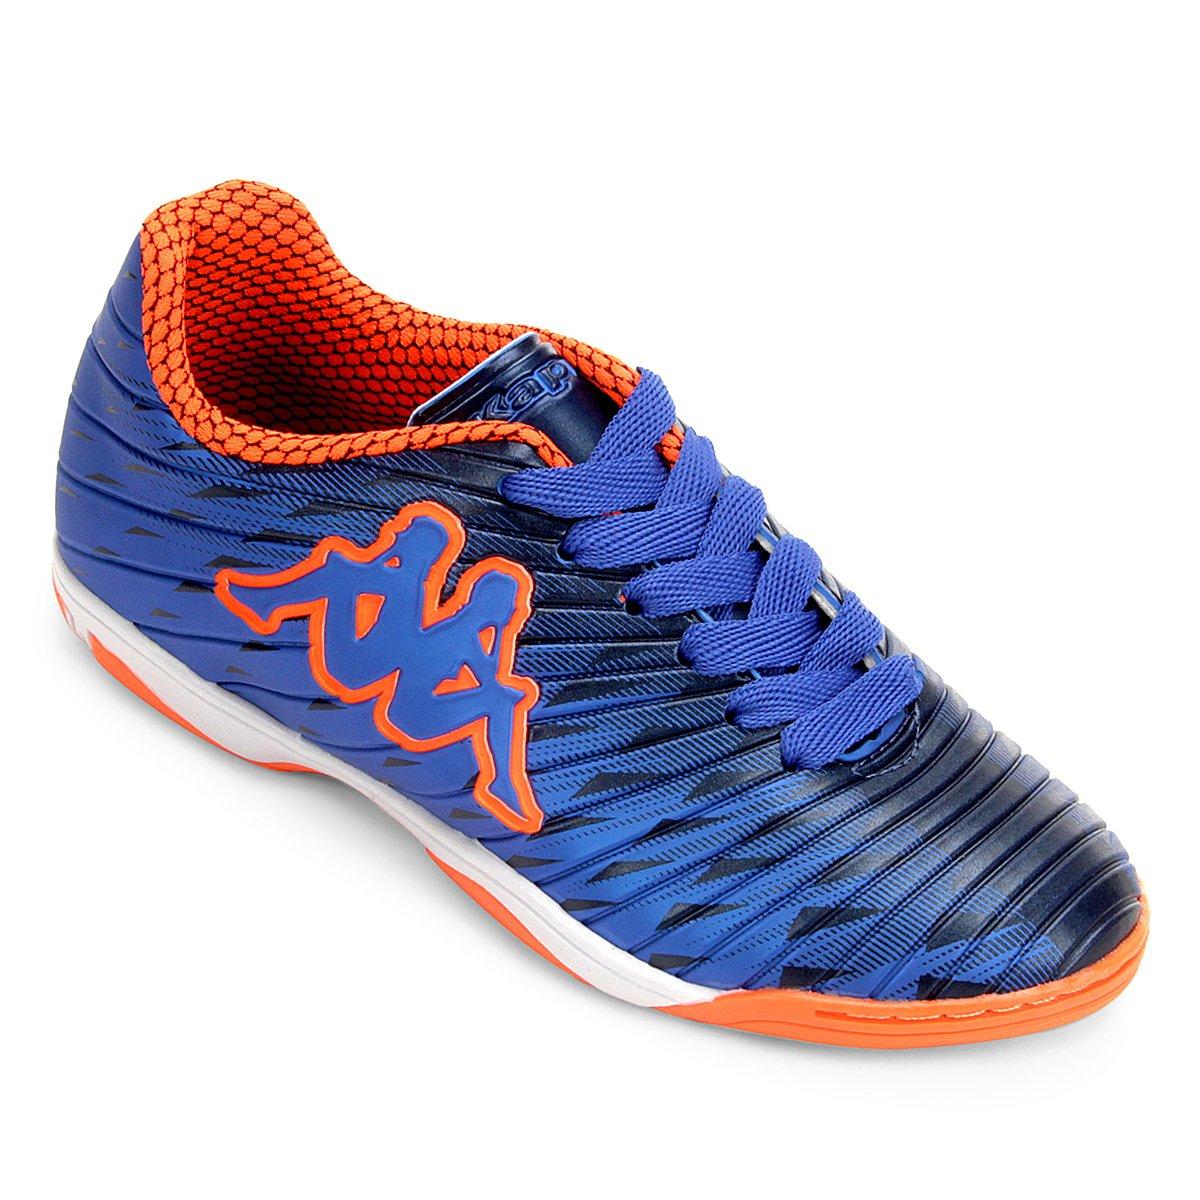 eaf07a6e85 Chuteira Futsal Infantil Kappa Thunder - Azul e Laranja - Compre ...